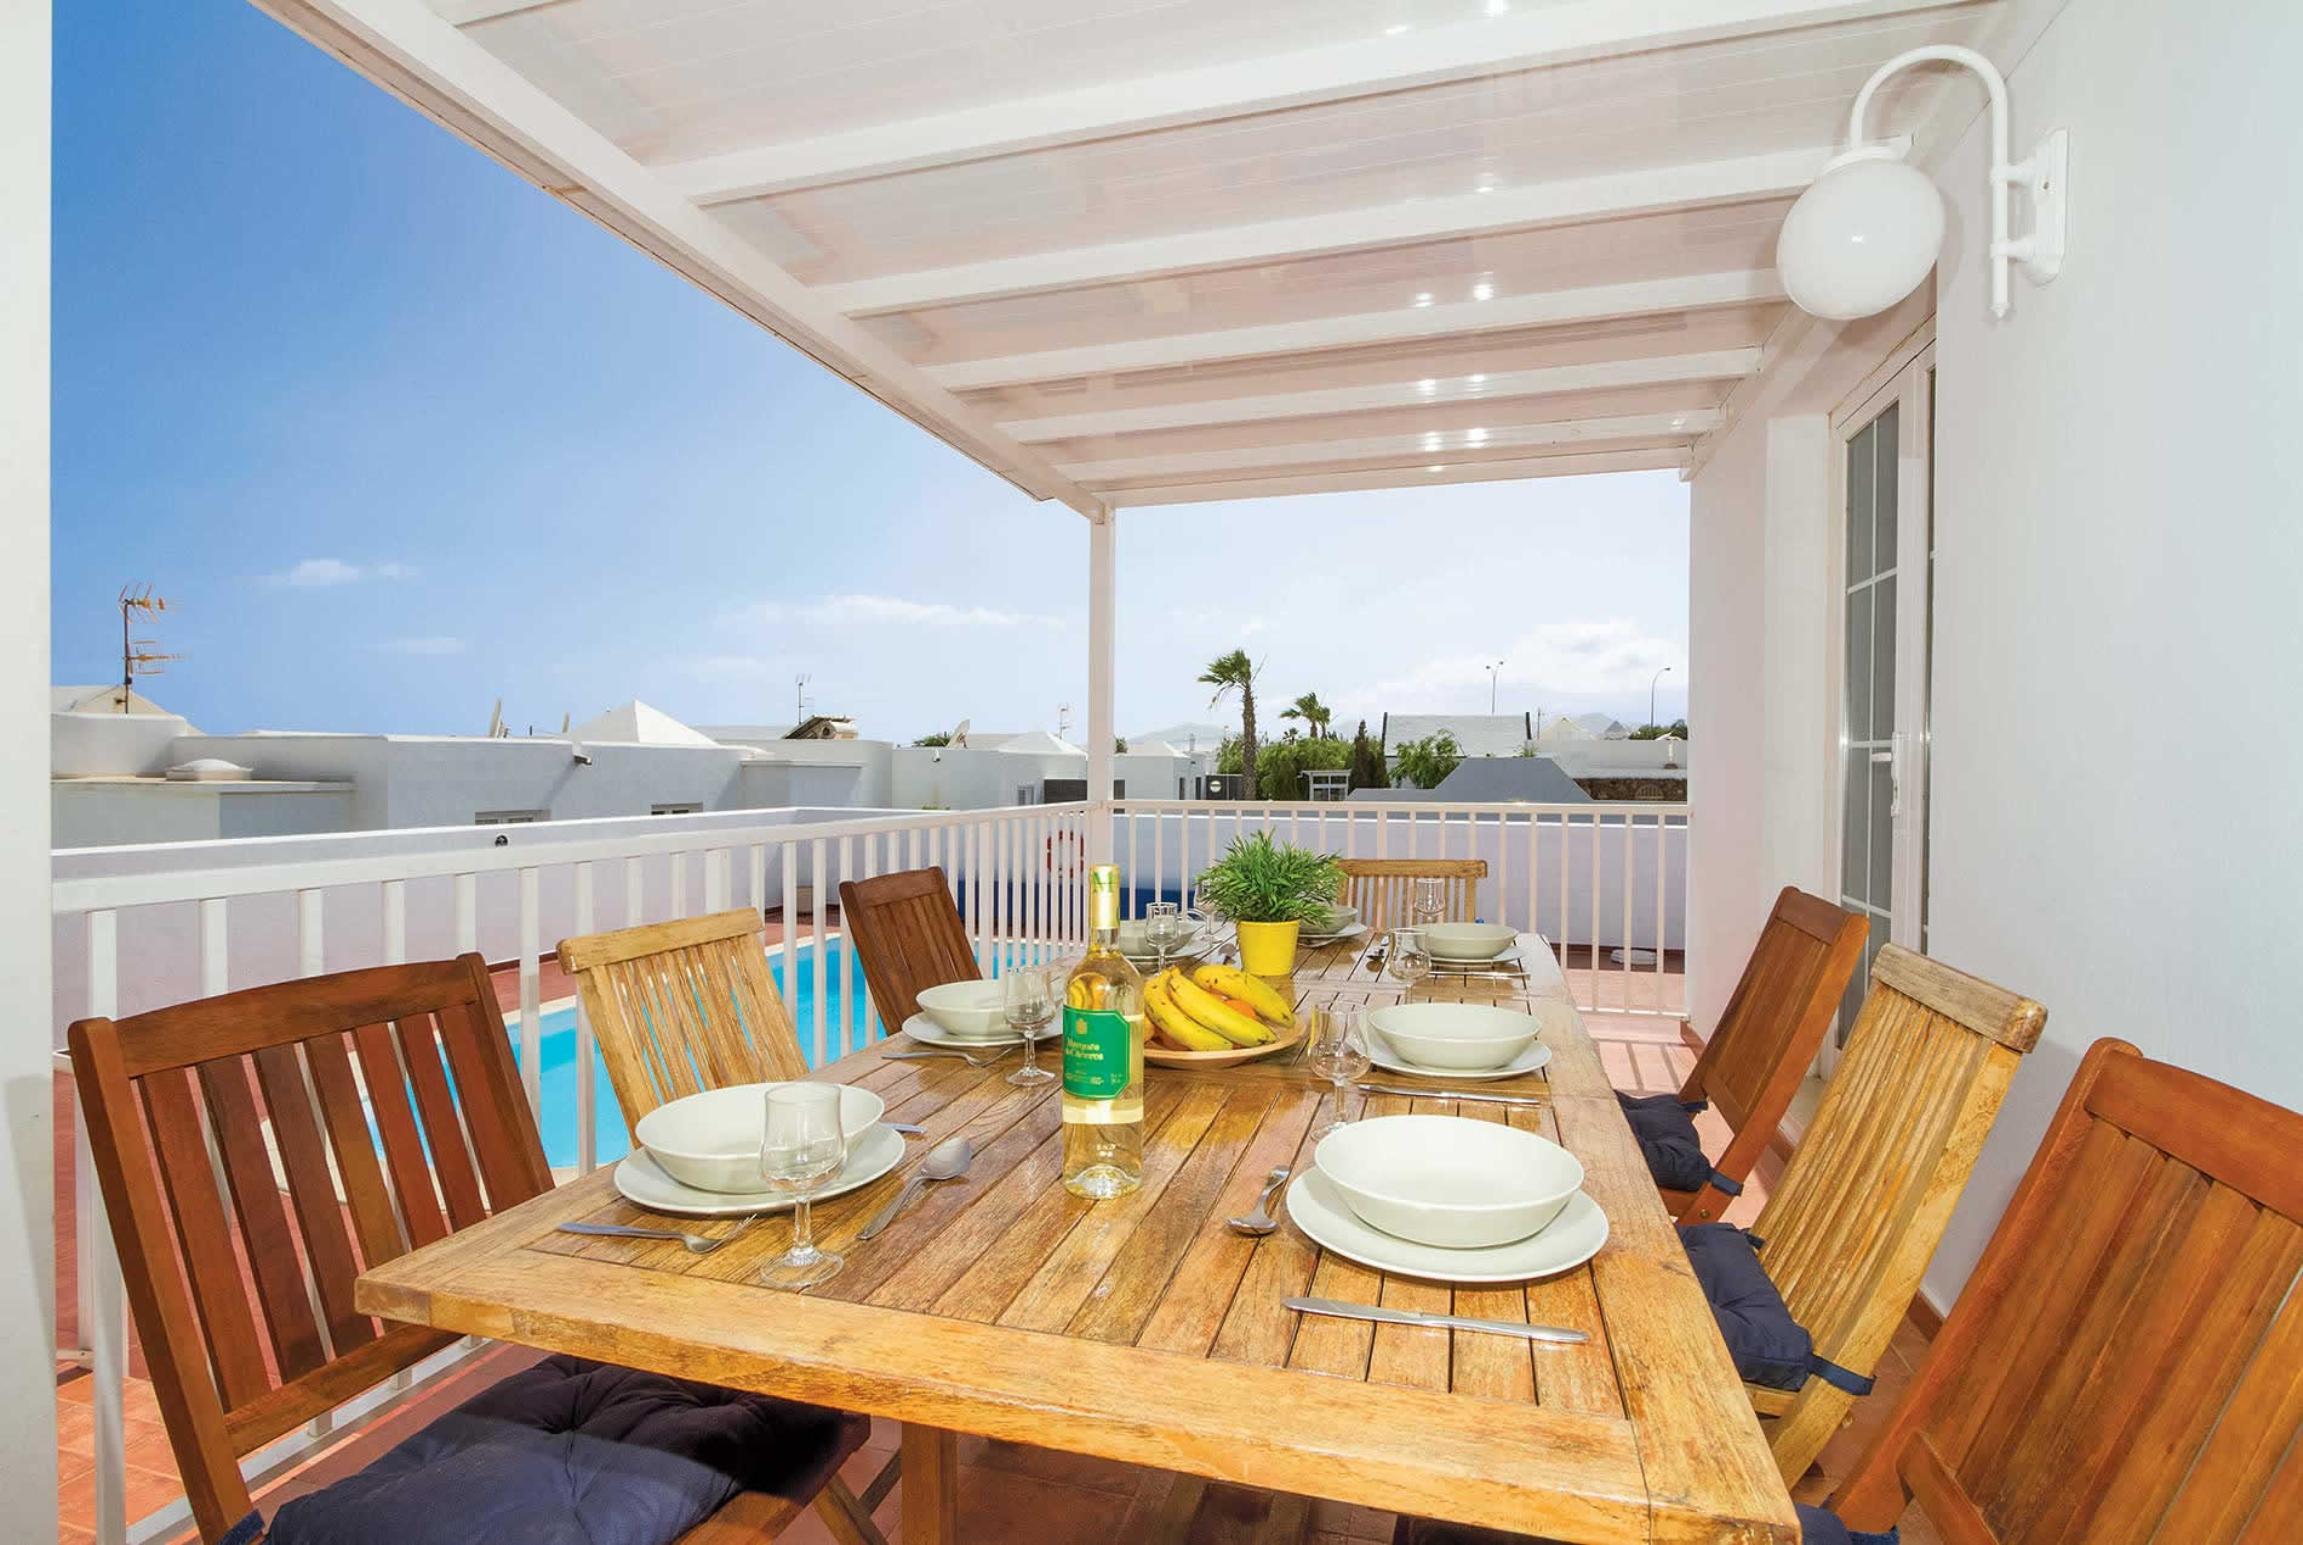 Ferienhaus Casa Candela (2654390), Puerto del Carmen, Lanzarote, Kanarische Inseln, Spanien, Bild 10